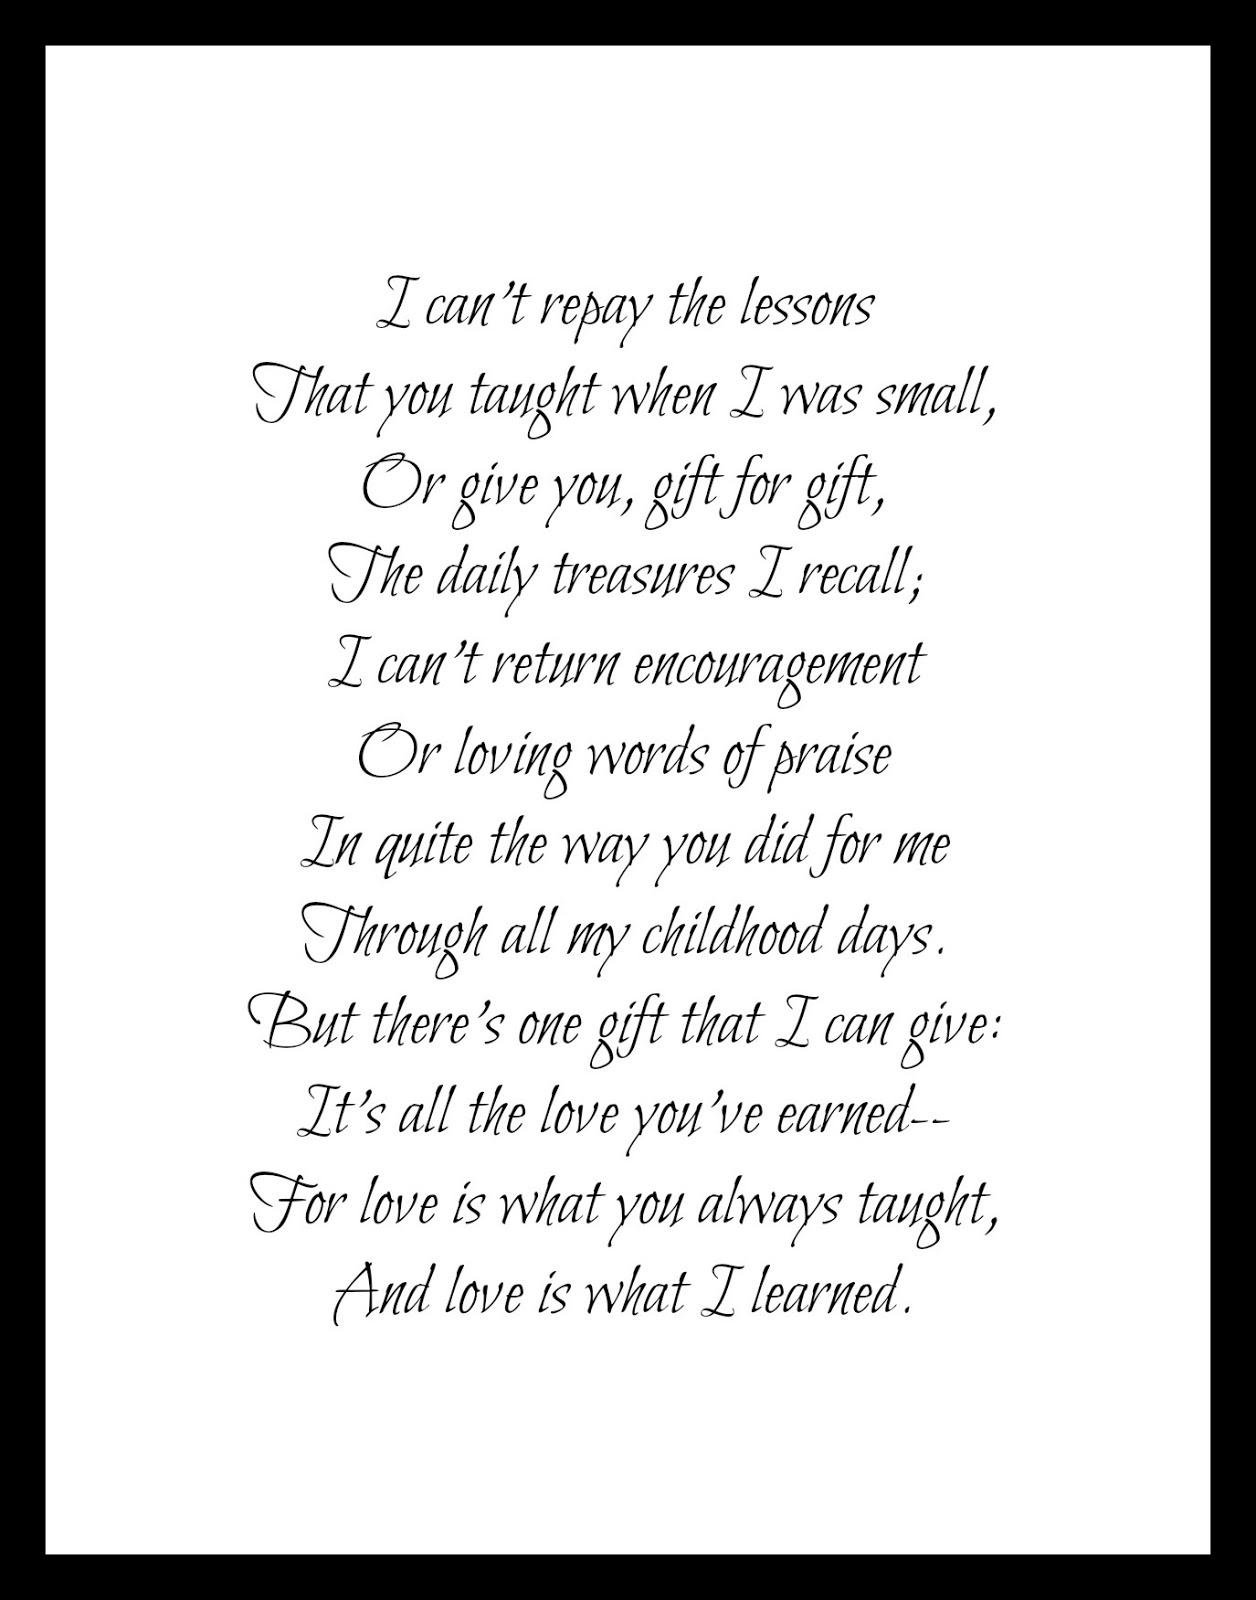 https://2.bp.blogspot.com/-P6lEWr5t9lk/U2ogcJUaPqI/AAAAAAAAJ_w/g5SUoYLrw6U/s1600/Mother\u0027s+Day+poem+framed.jpg